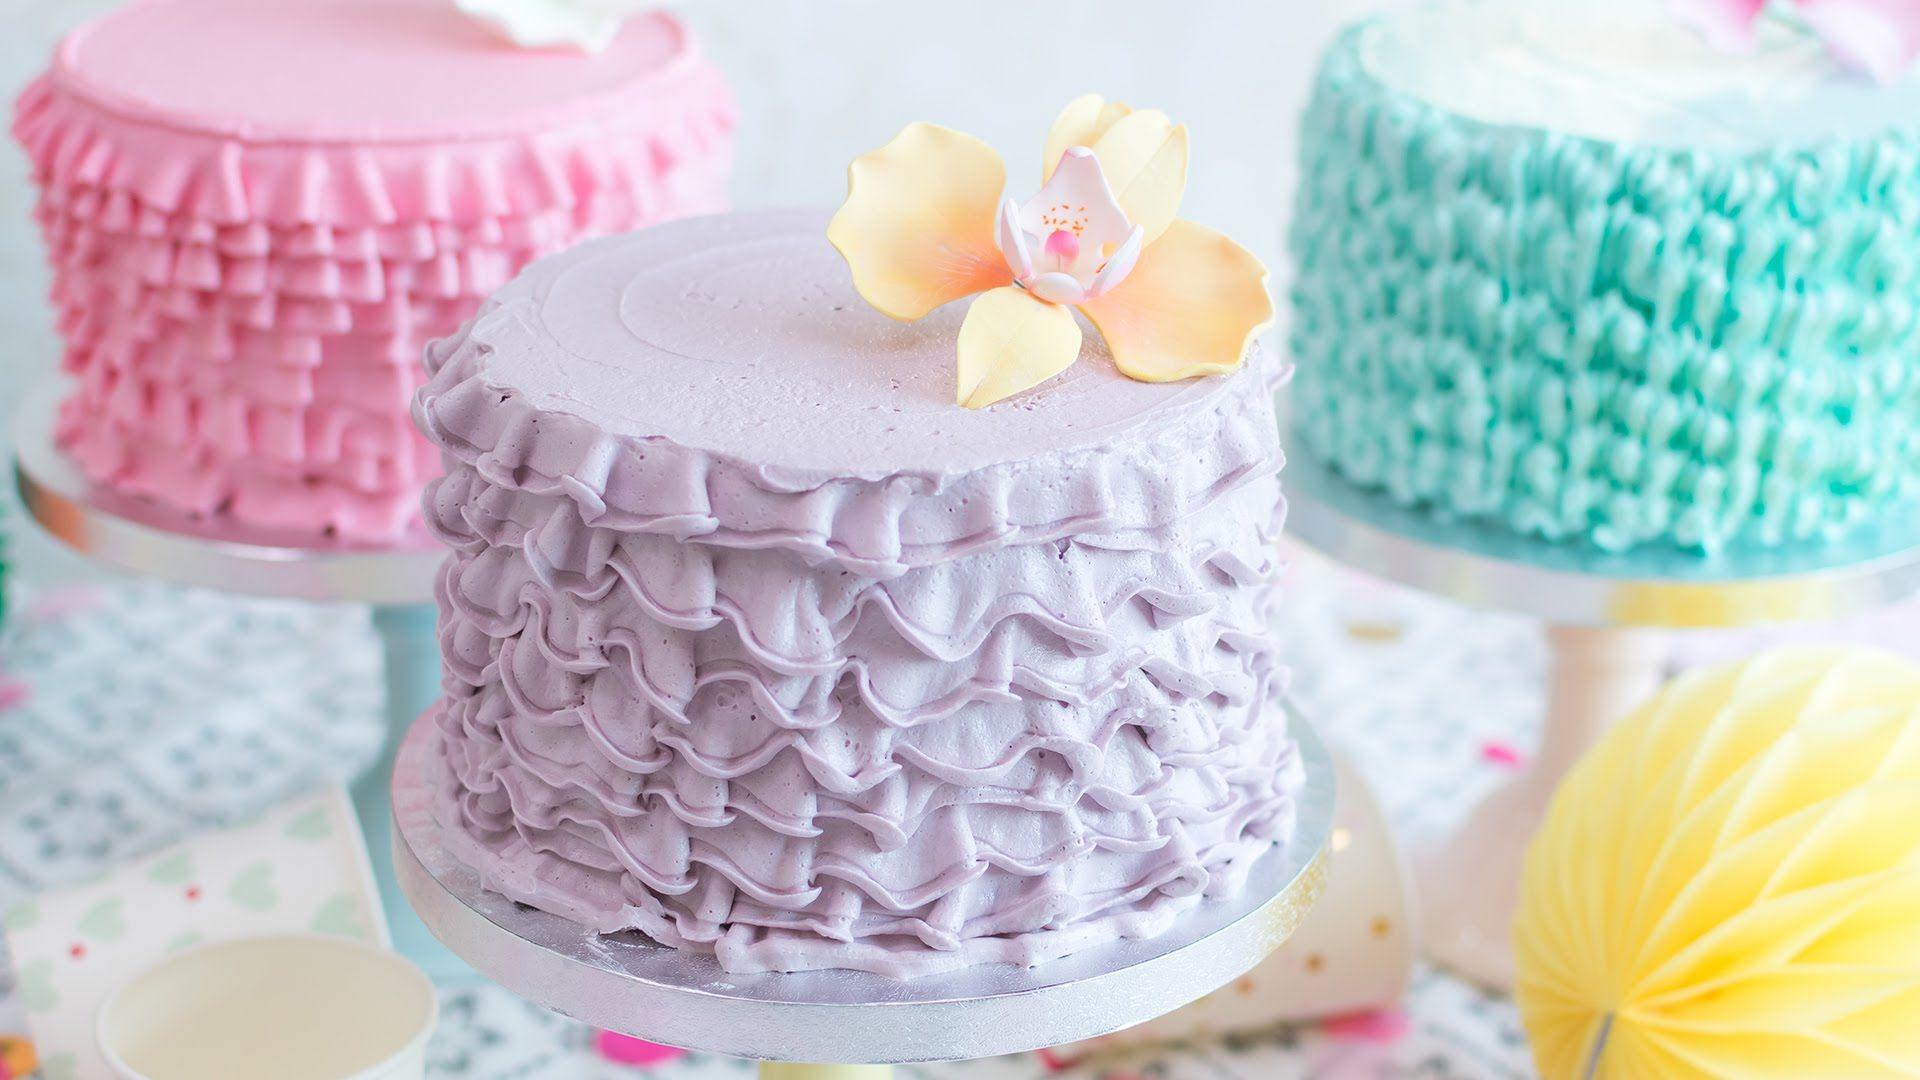 Cómo hacer ruffle cakes o tartas con volantes - Tutorial - María ...